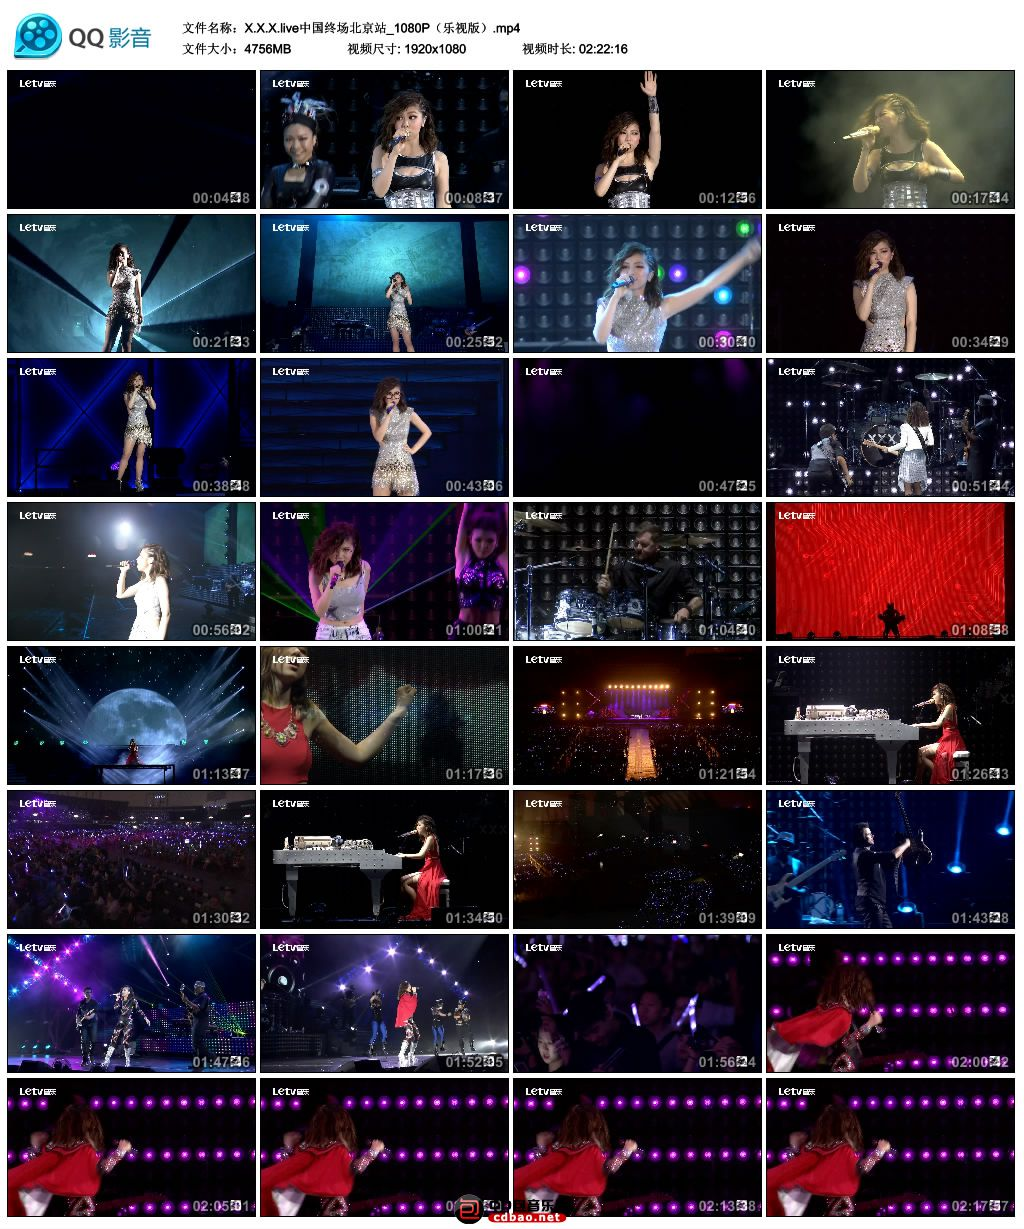 X.X.X.live中国终场北京站_1080P(乐视版).mp4_thumbs_2015.08.10.09_42_52.jpg